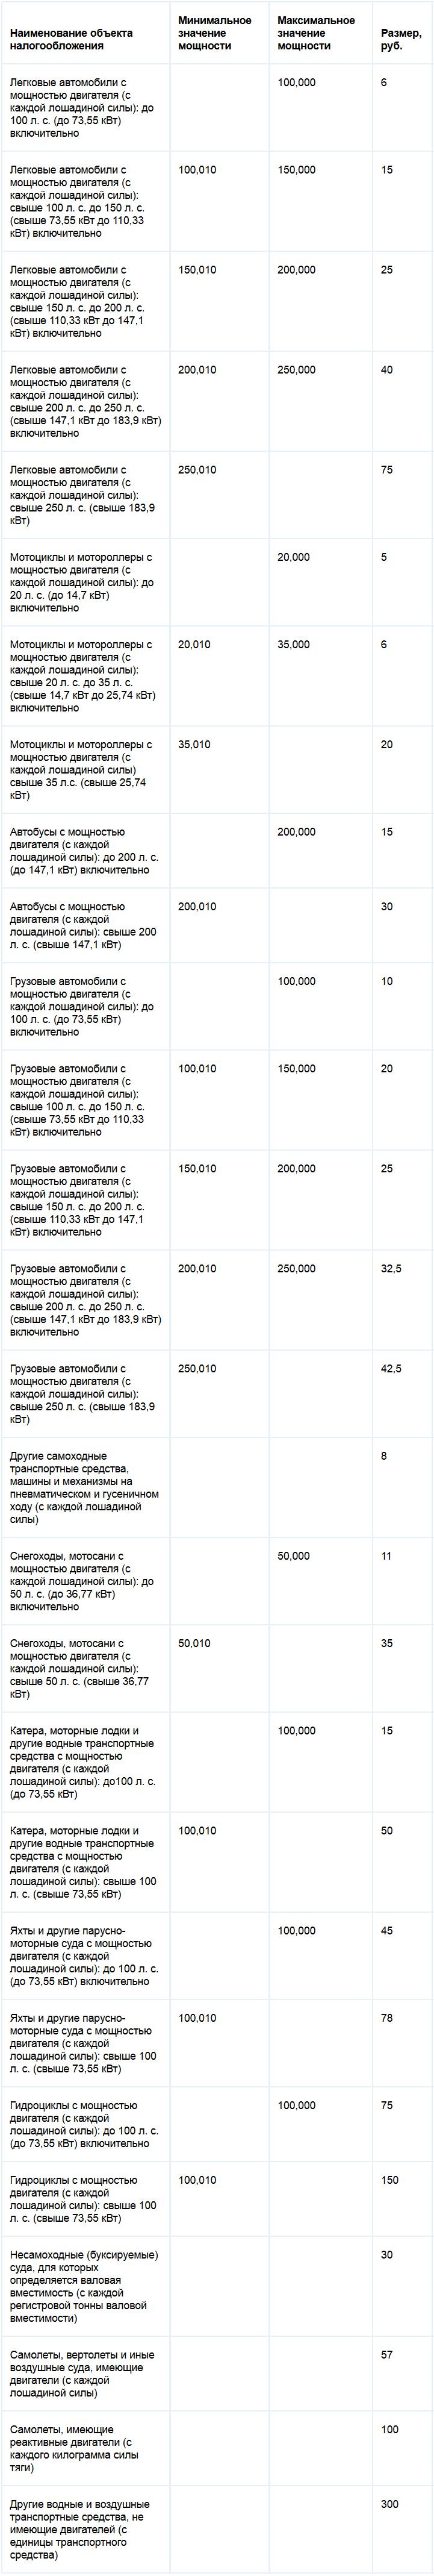 Ставки транспортного налога республики Хакасия